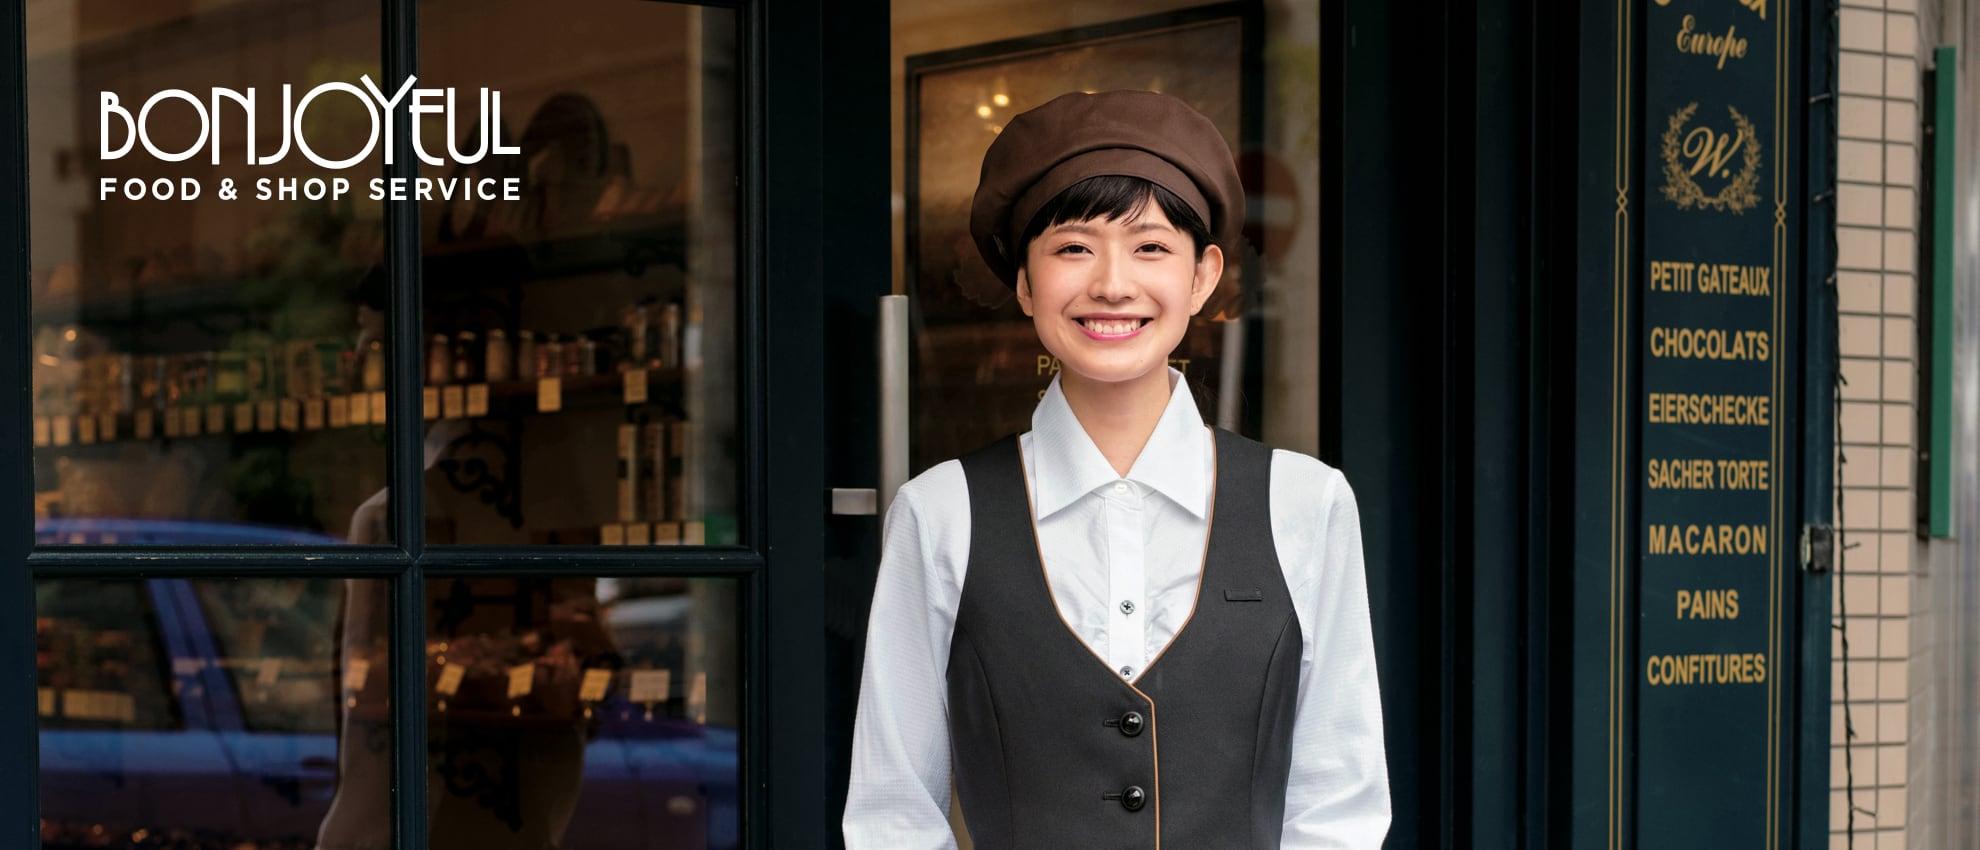 BonJoyful - Food & Shop Service Costumes |Boston Group - Japan